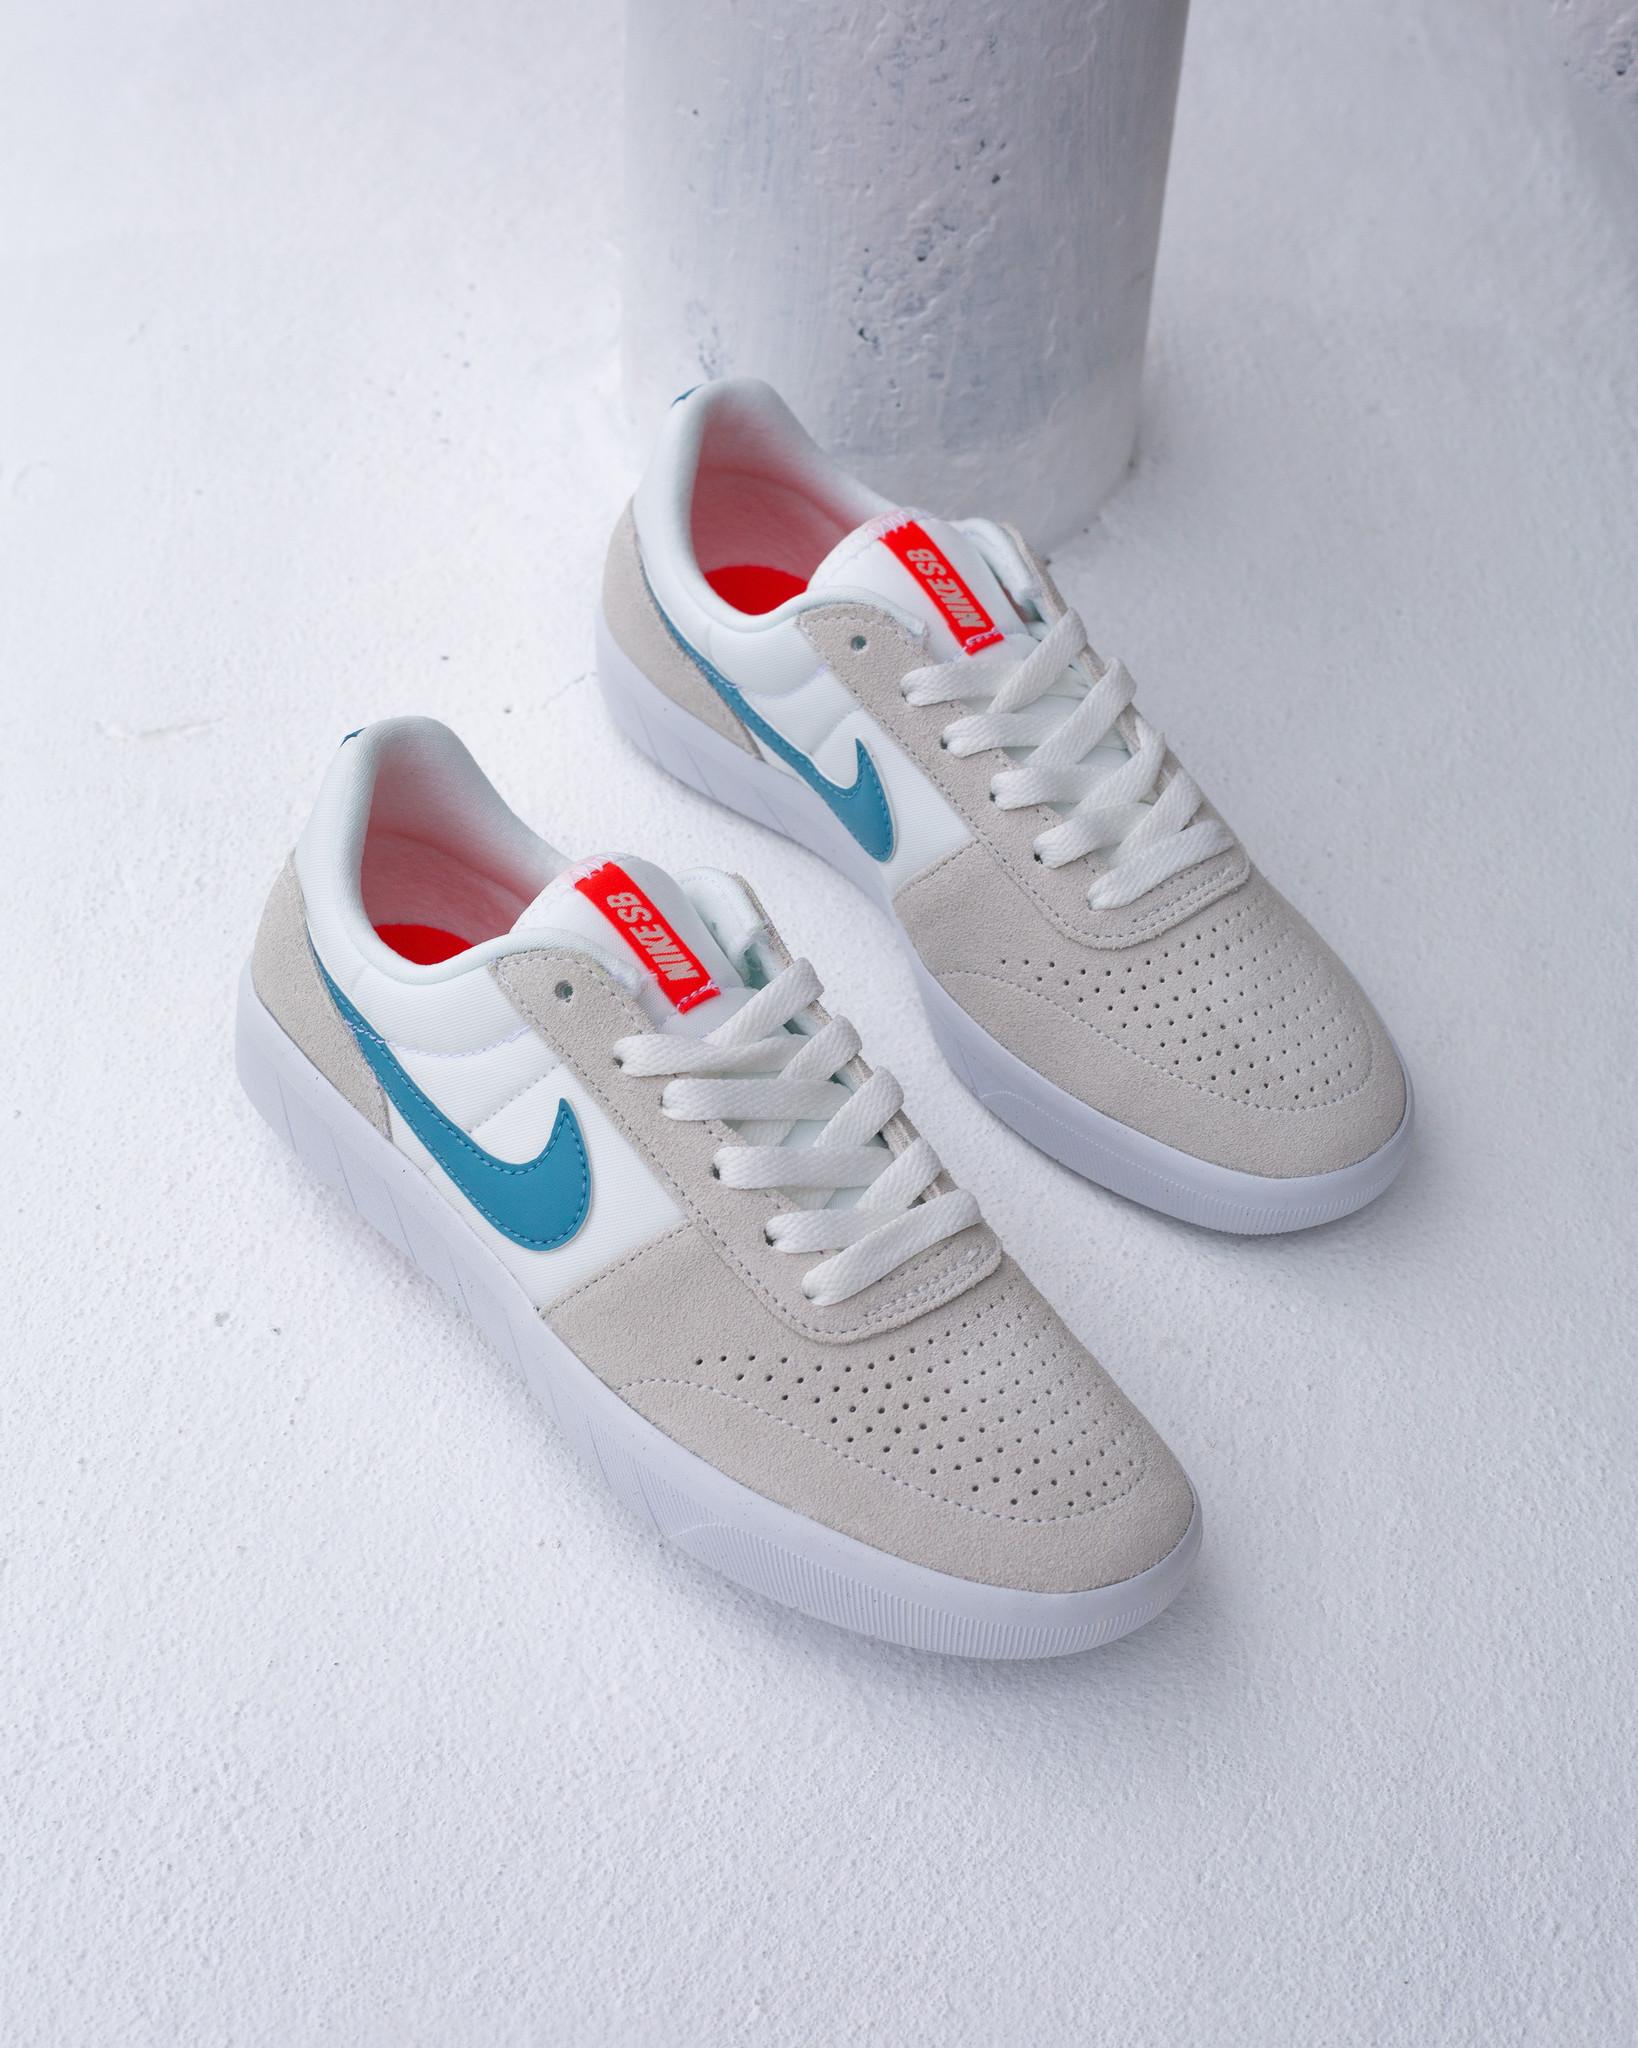 Nike SB Team Classic Summit White/Cerulean